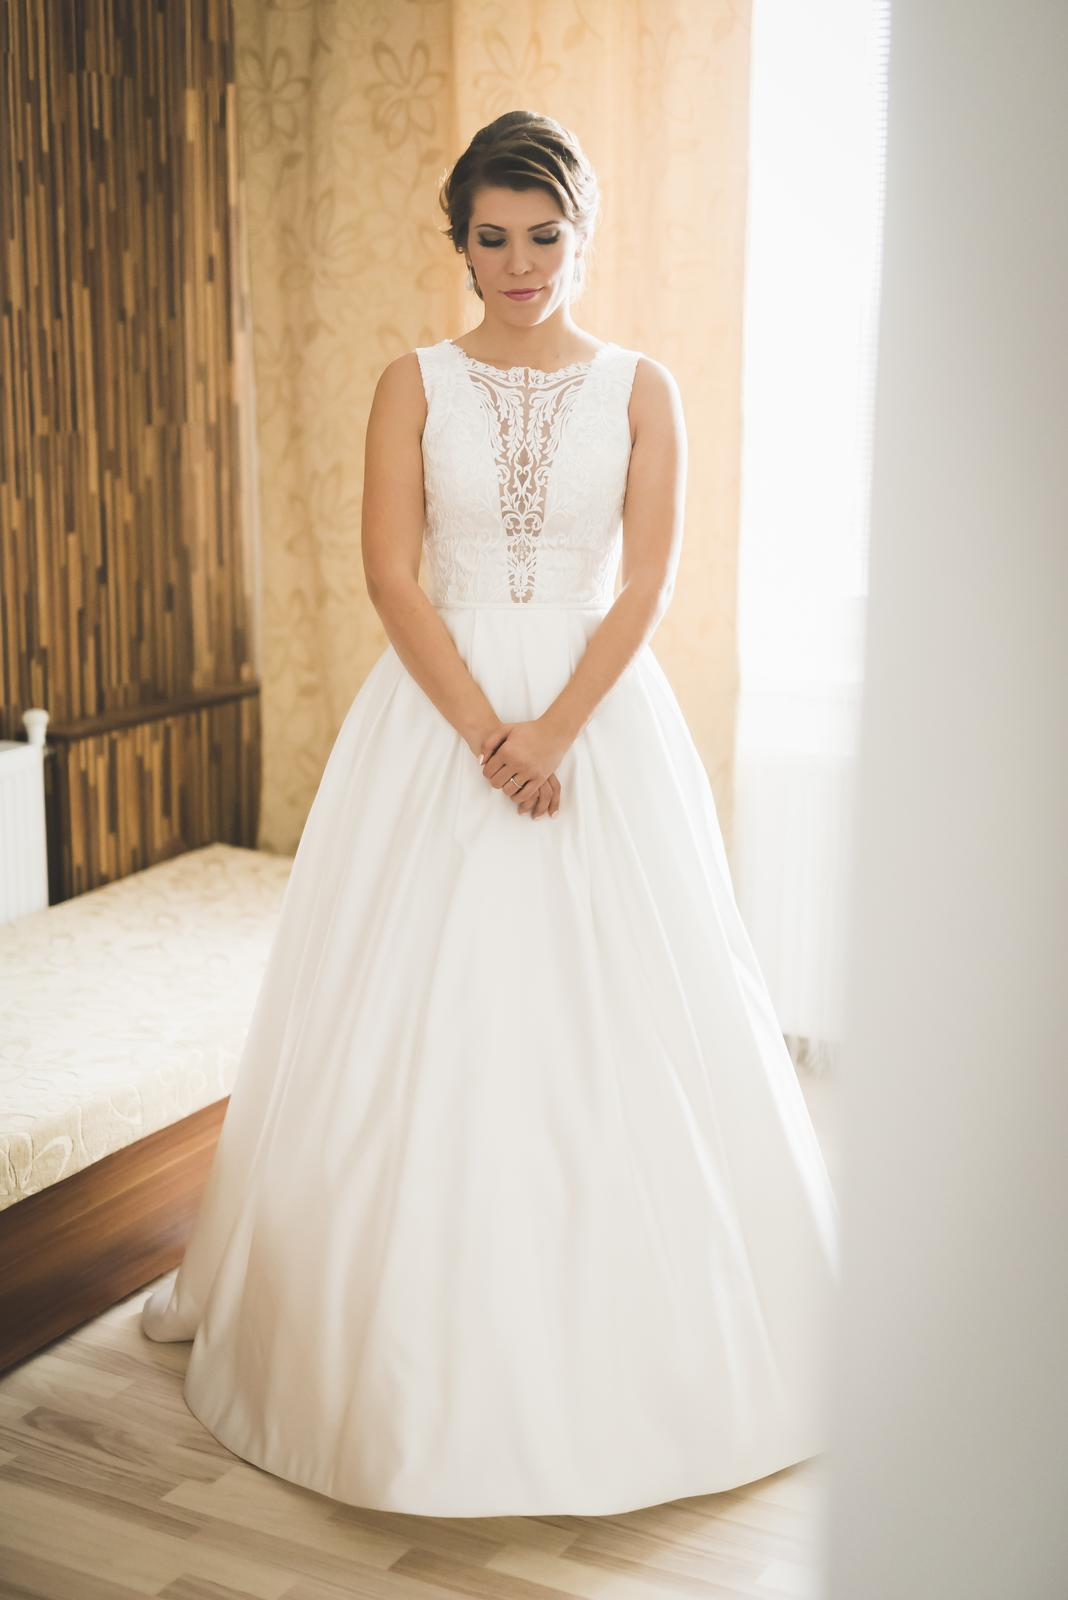 cb05d5b68c6c Svadobné šaty monica loretti